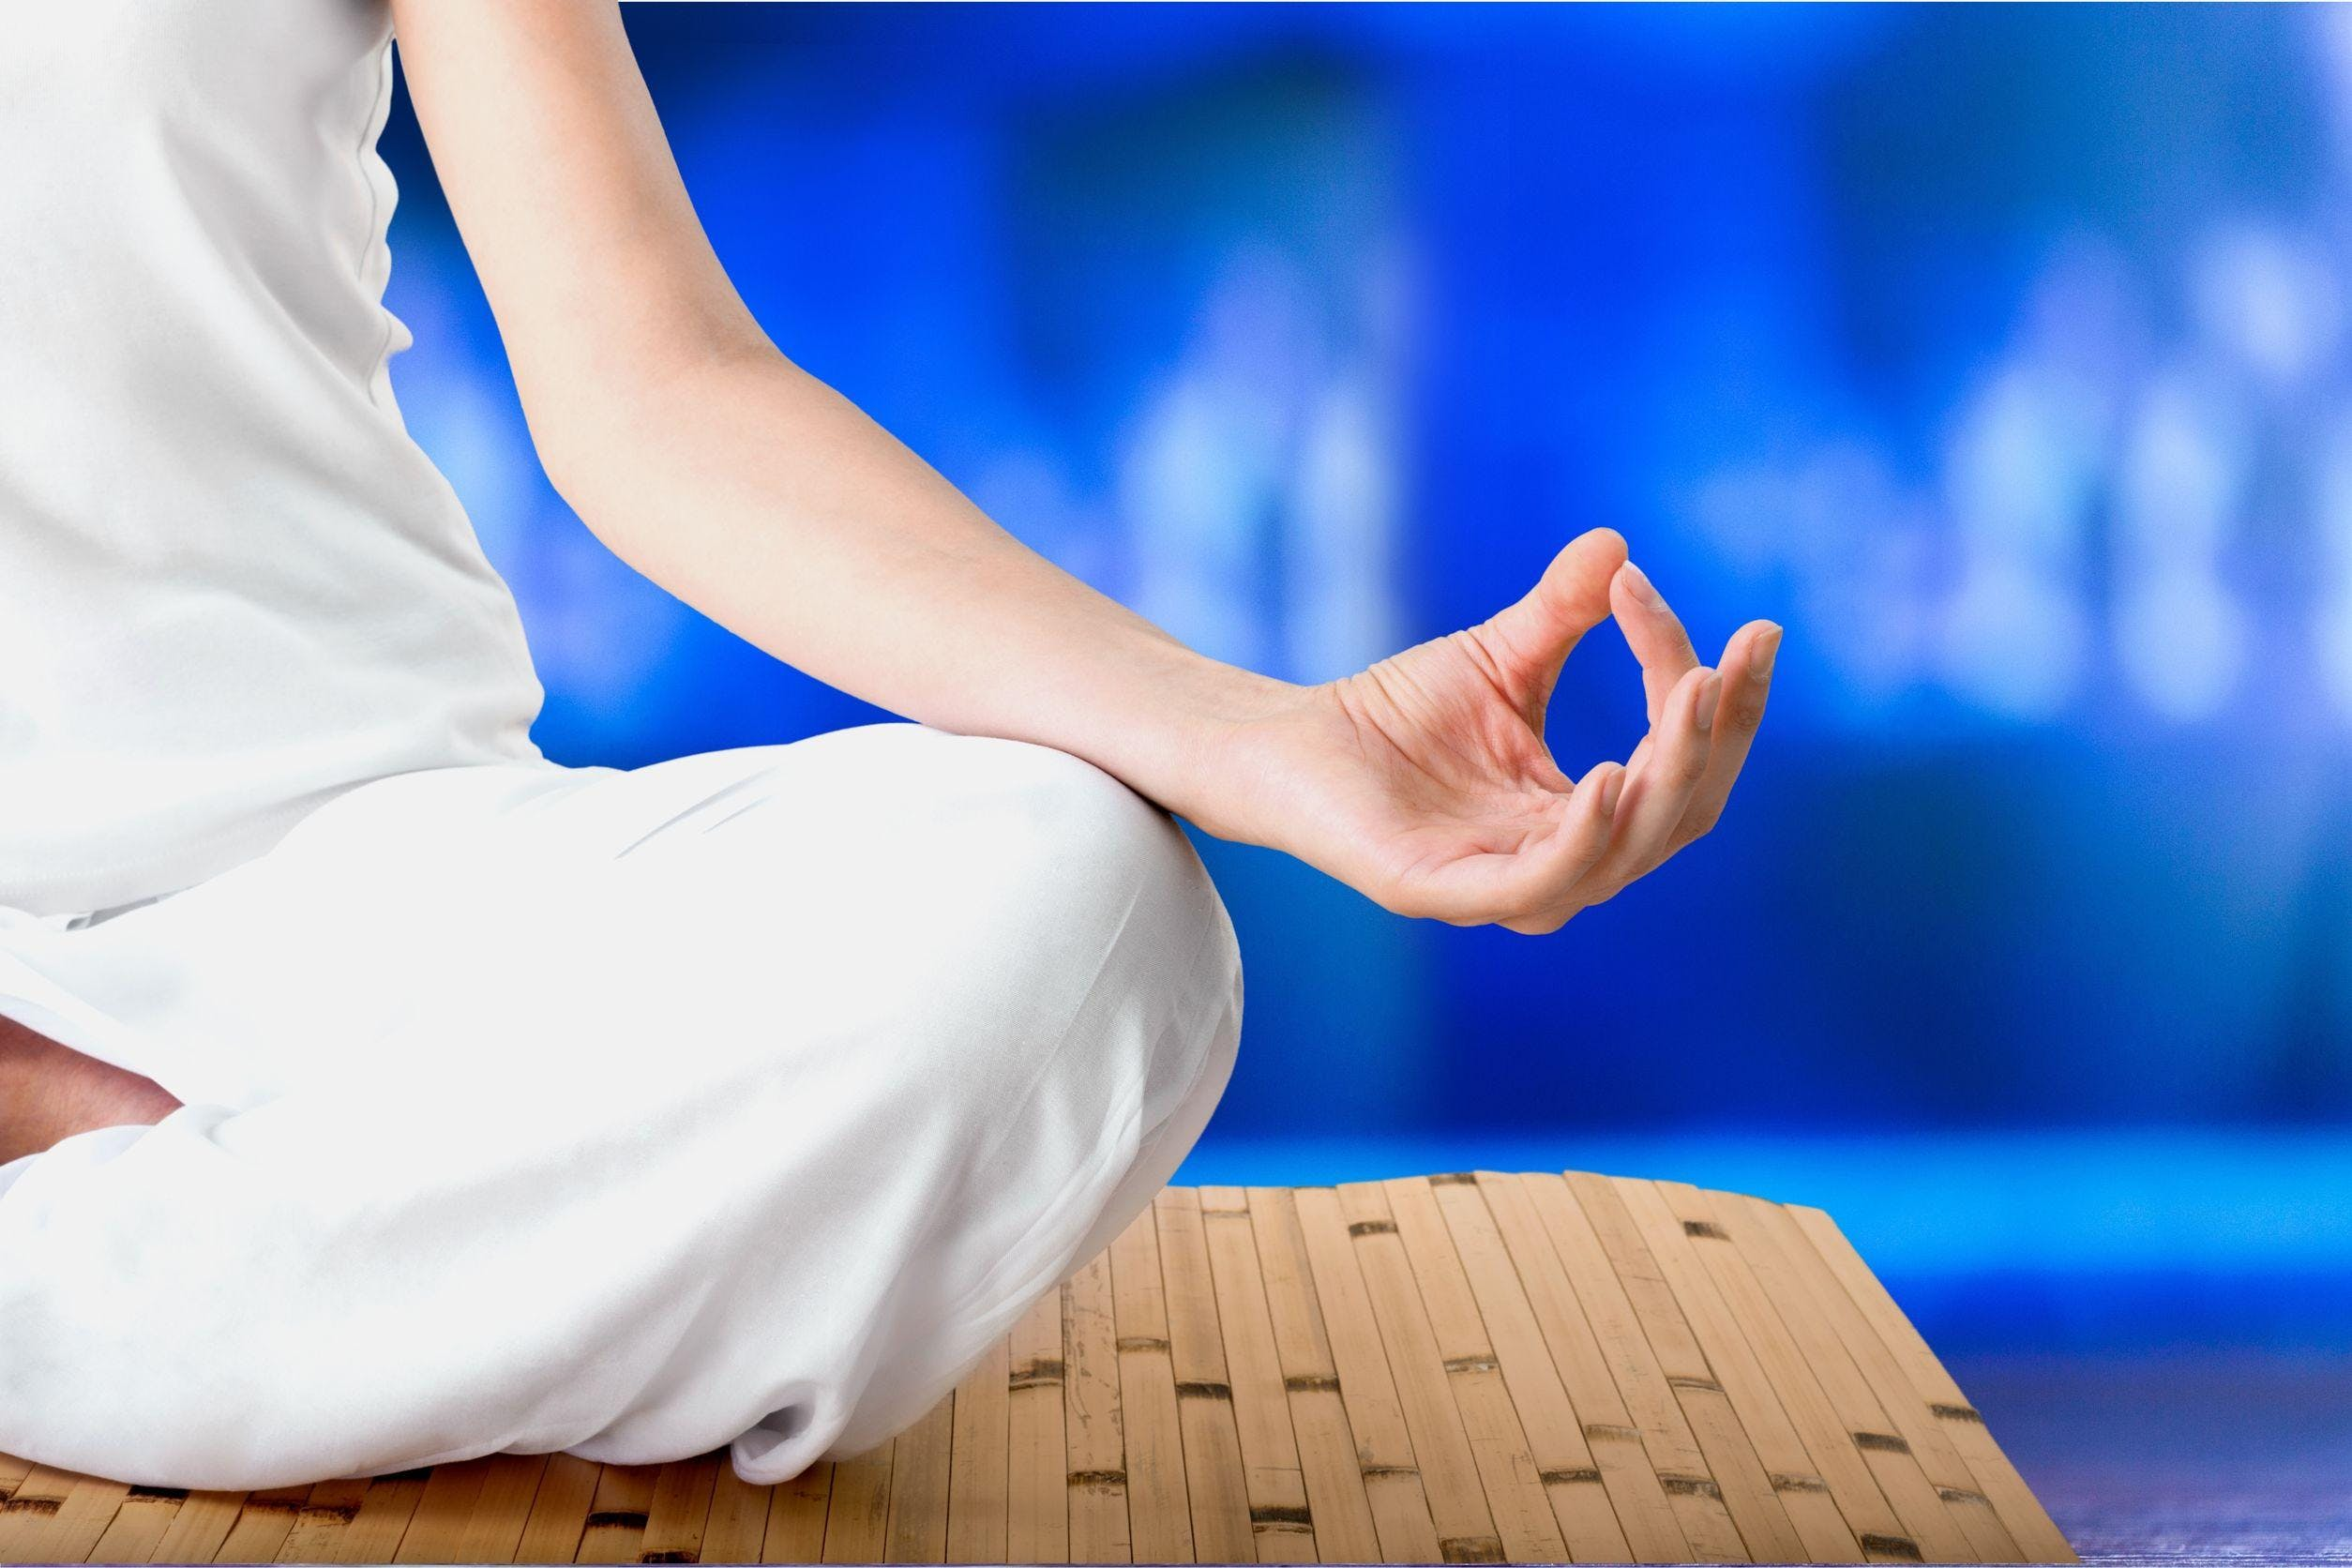 FREE Yoga class - alfresco. International Day of Yoga